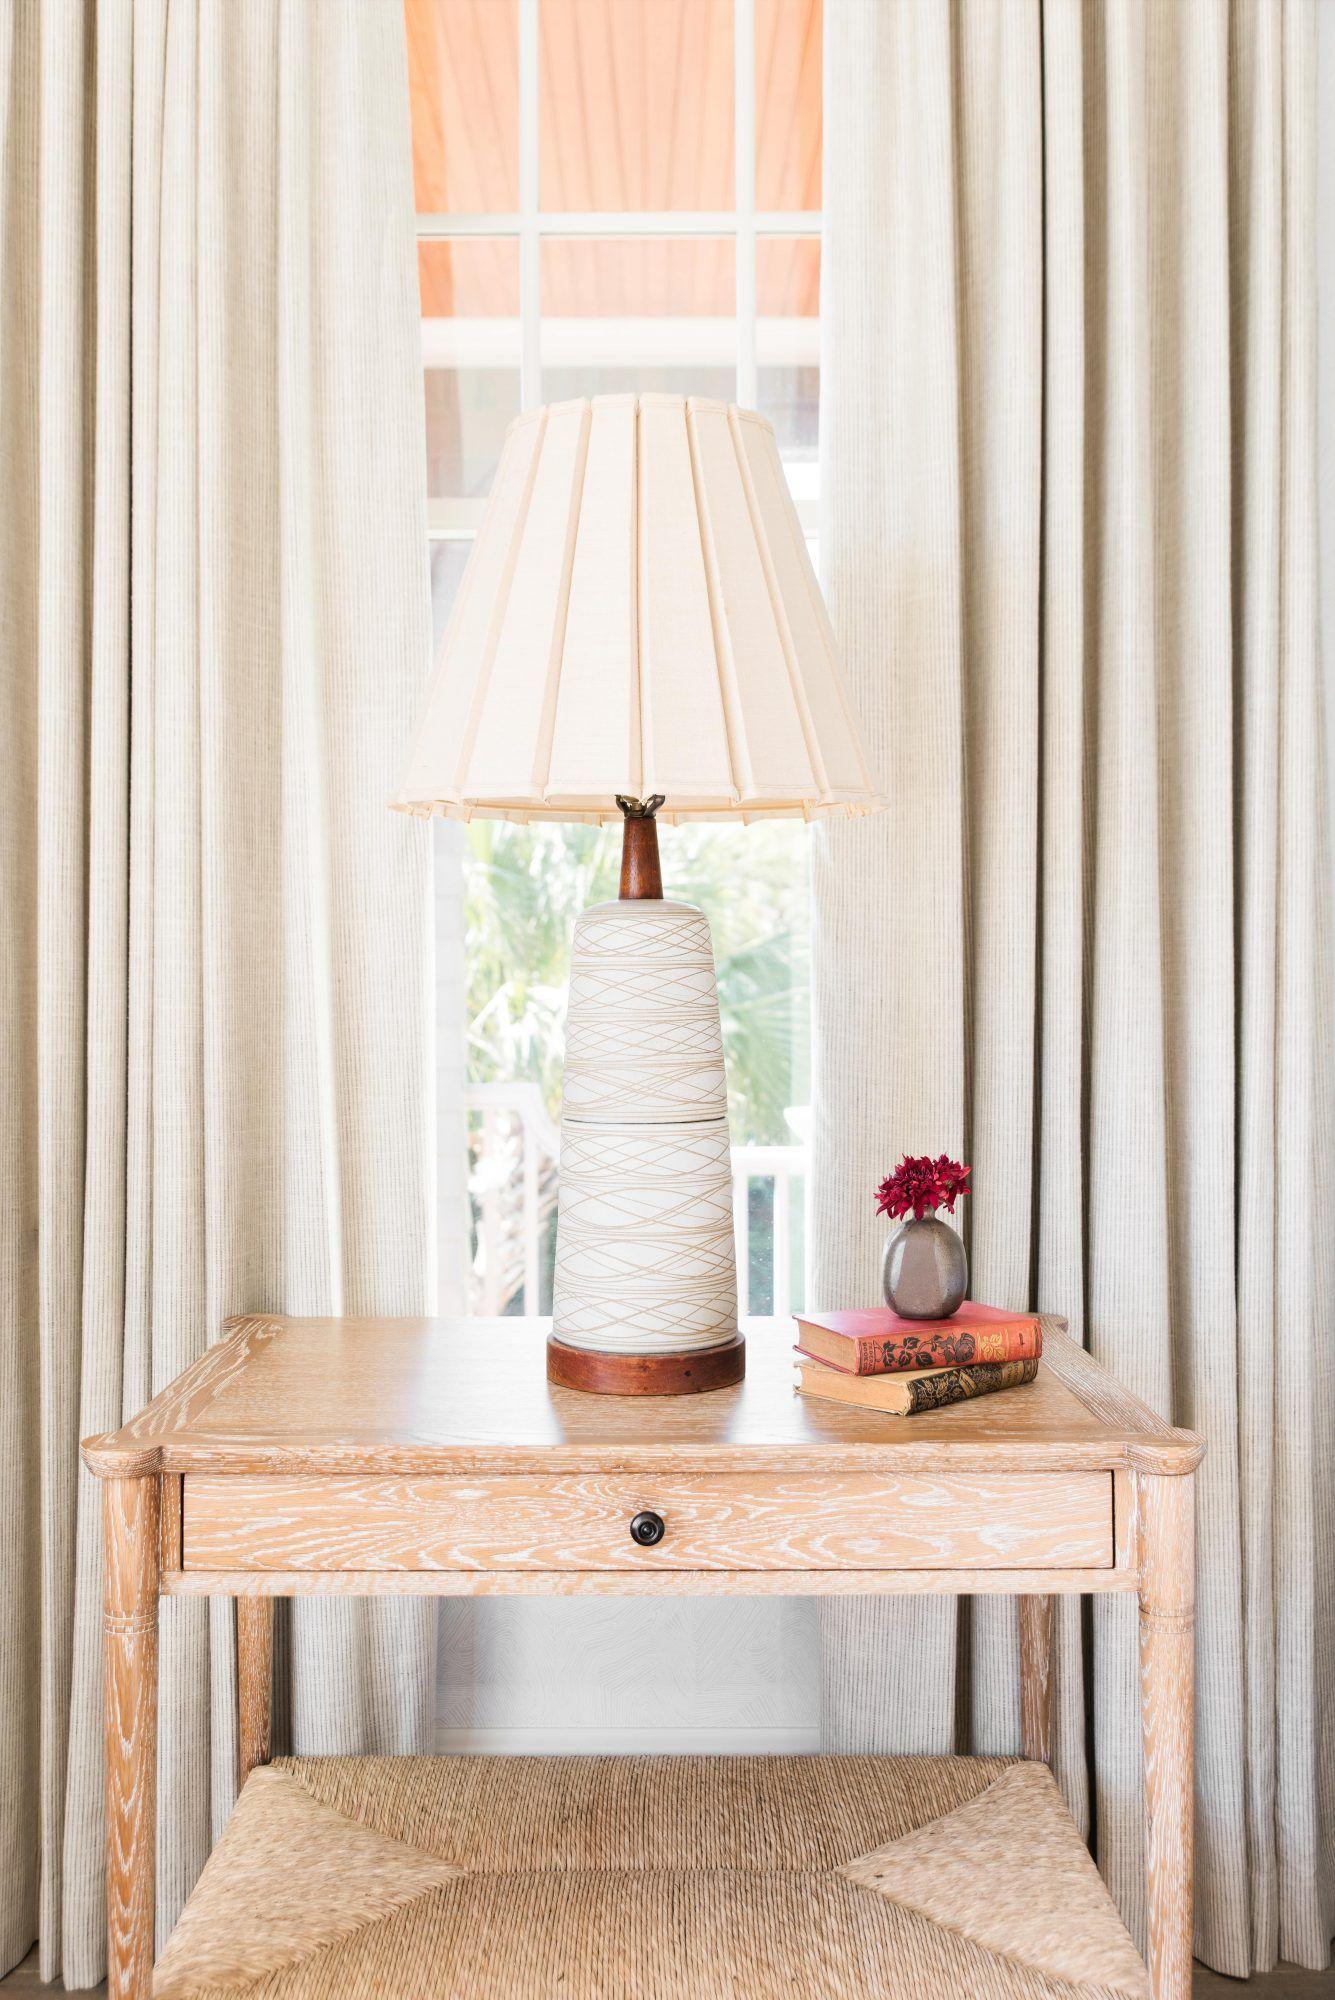 Cortney Kiawah island beach, Table lamps for